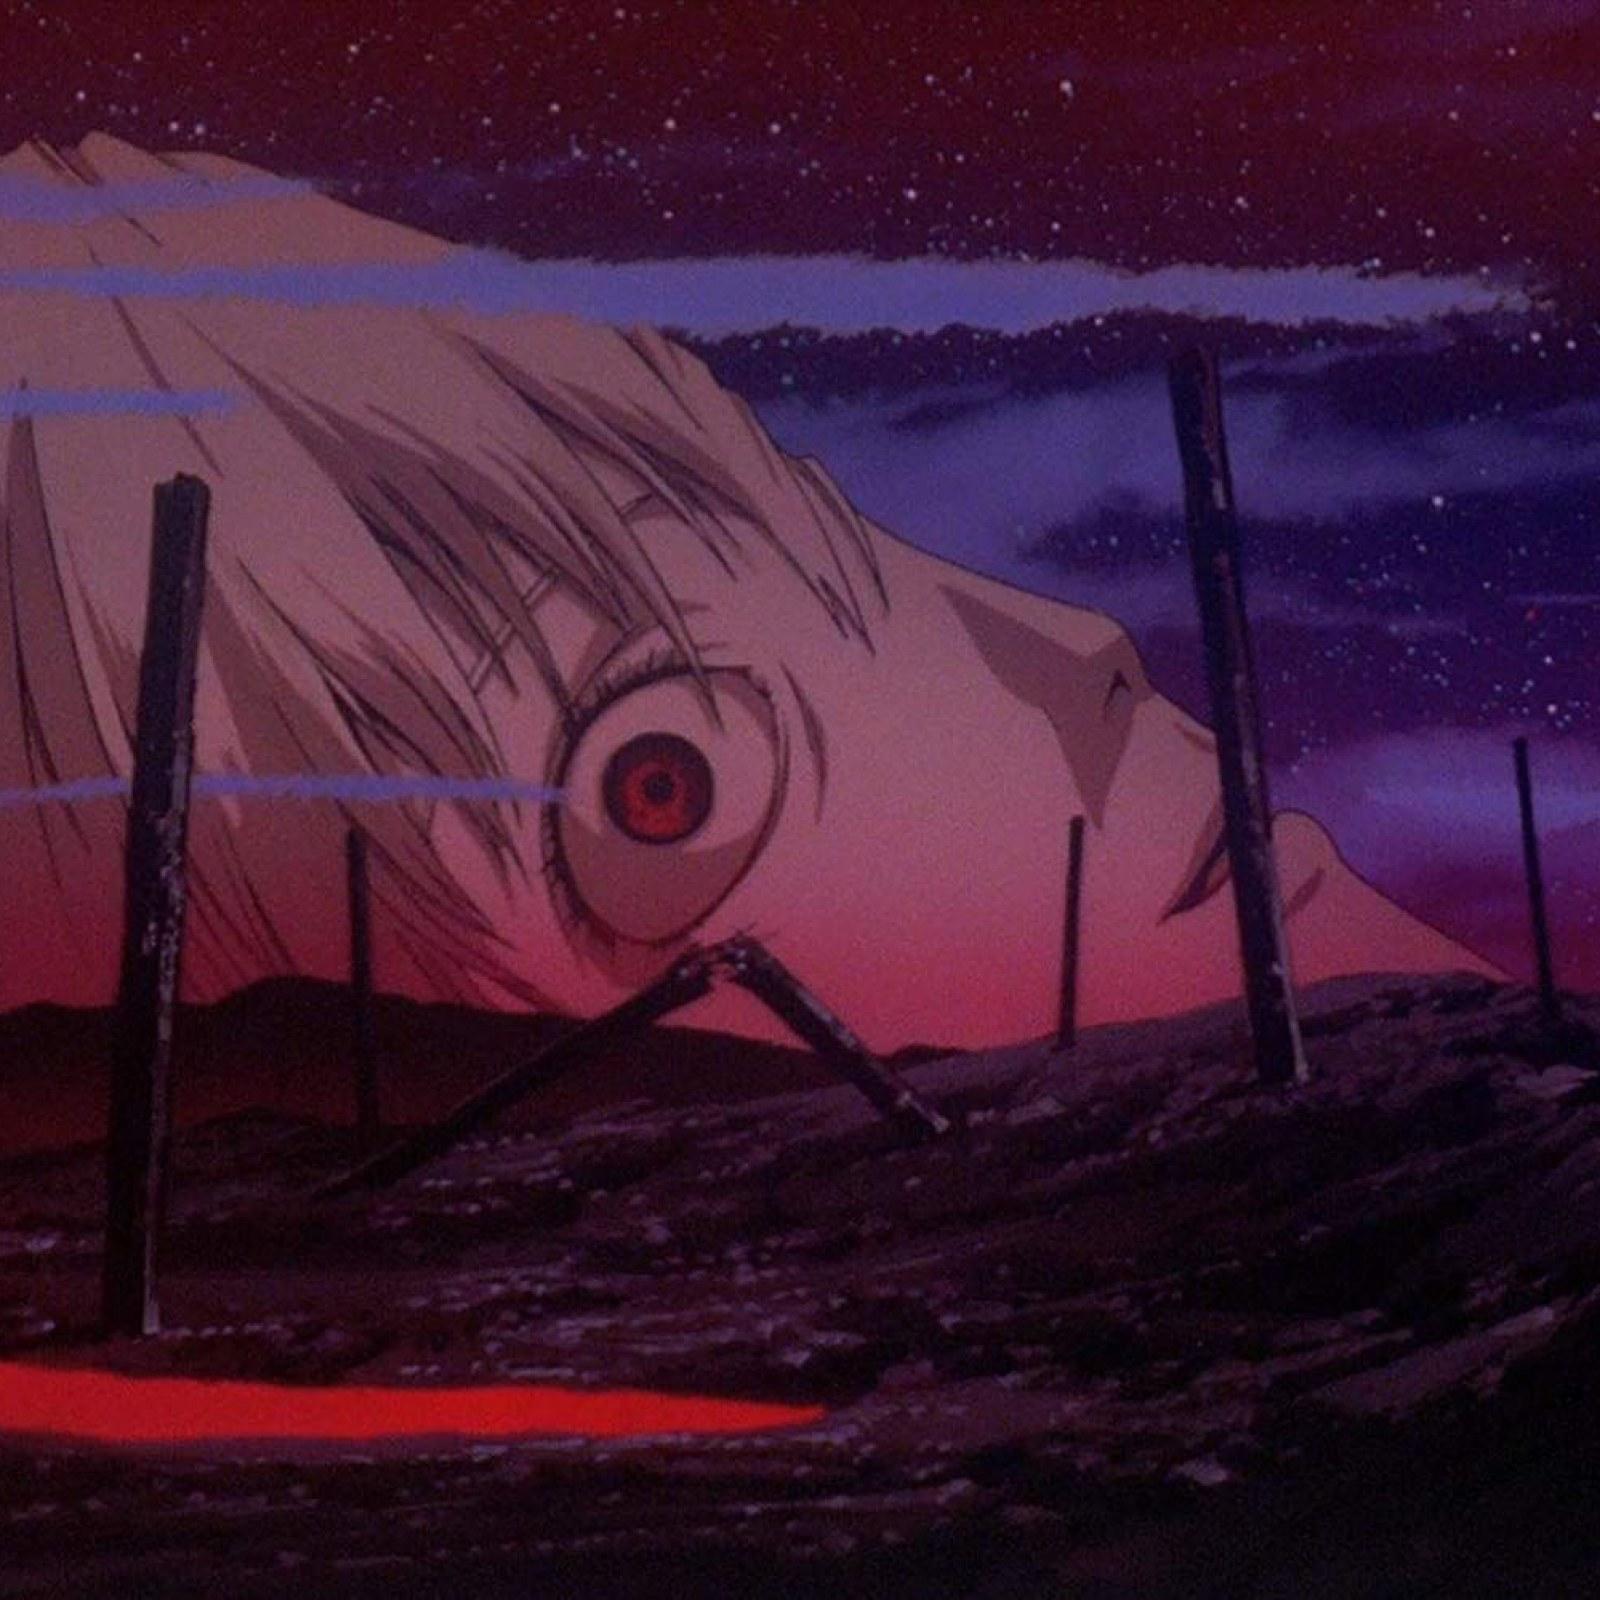 Neon Genesis Evangelion' on Netflix: What are 'End of Evangelion ...